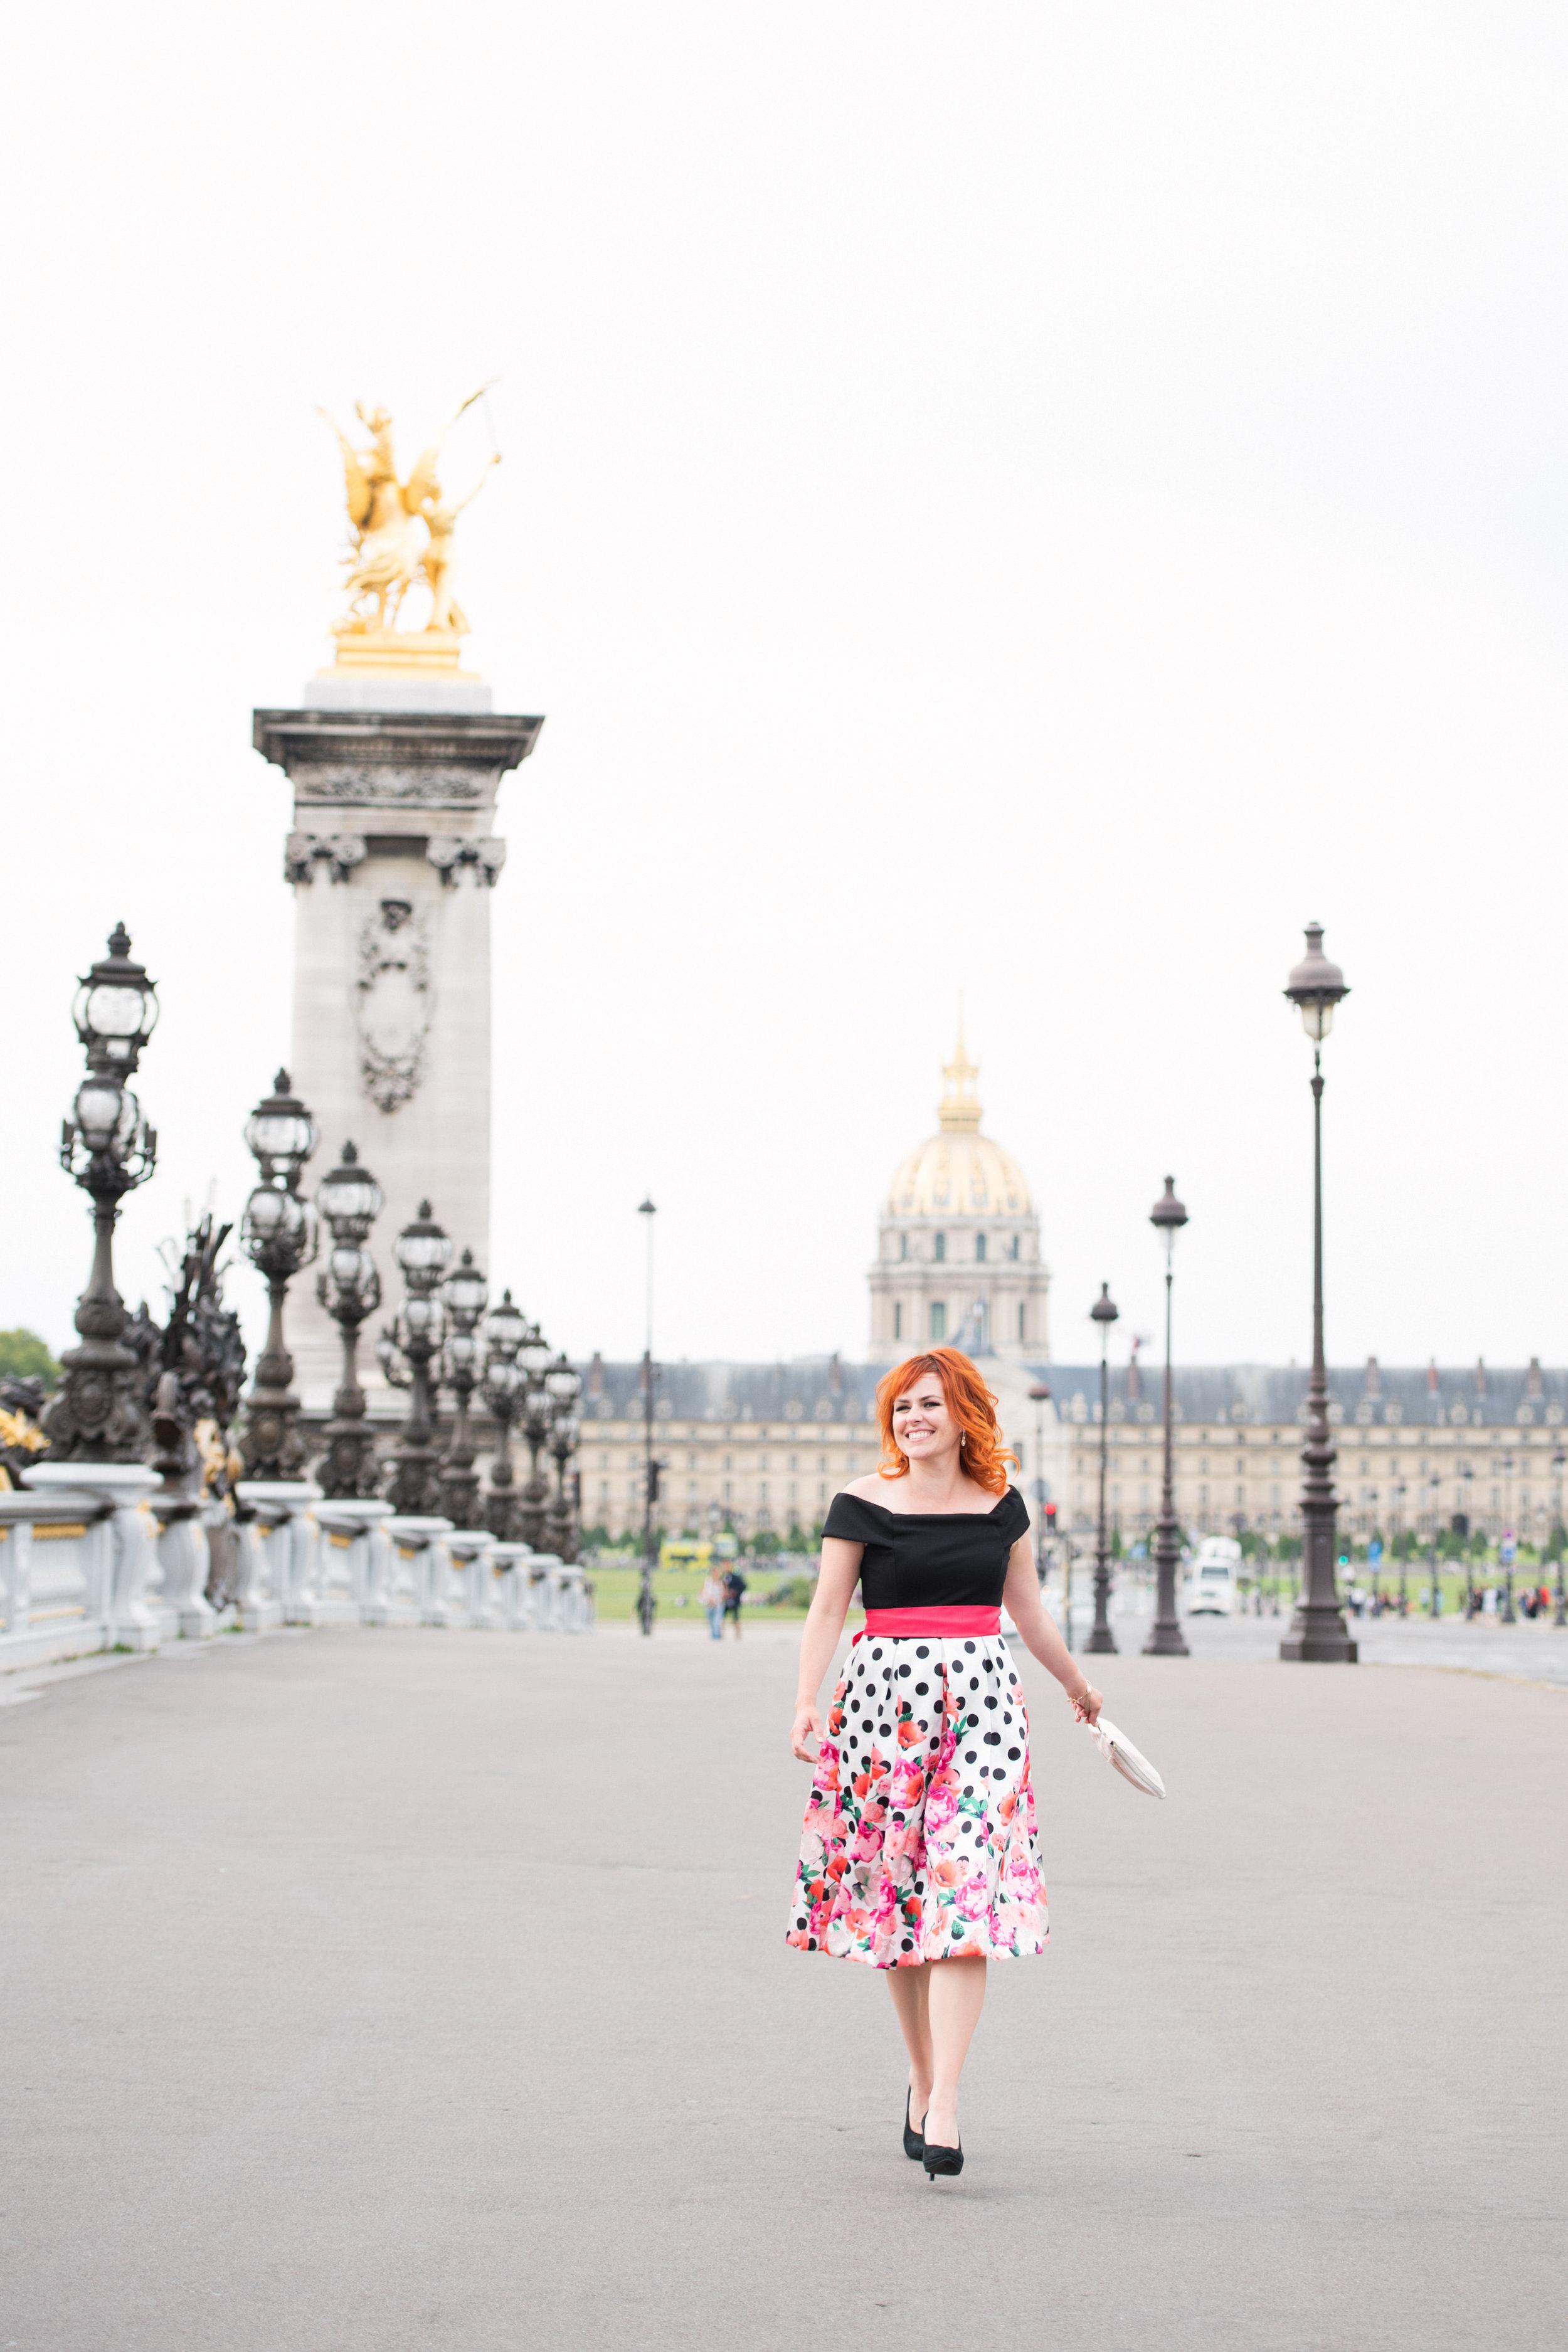 Paris portrait photoshoot 65.jpg